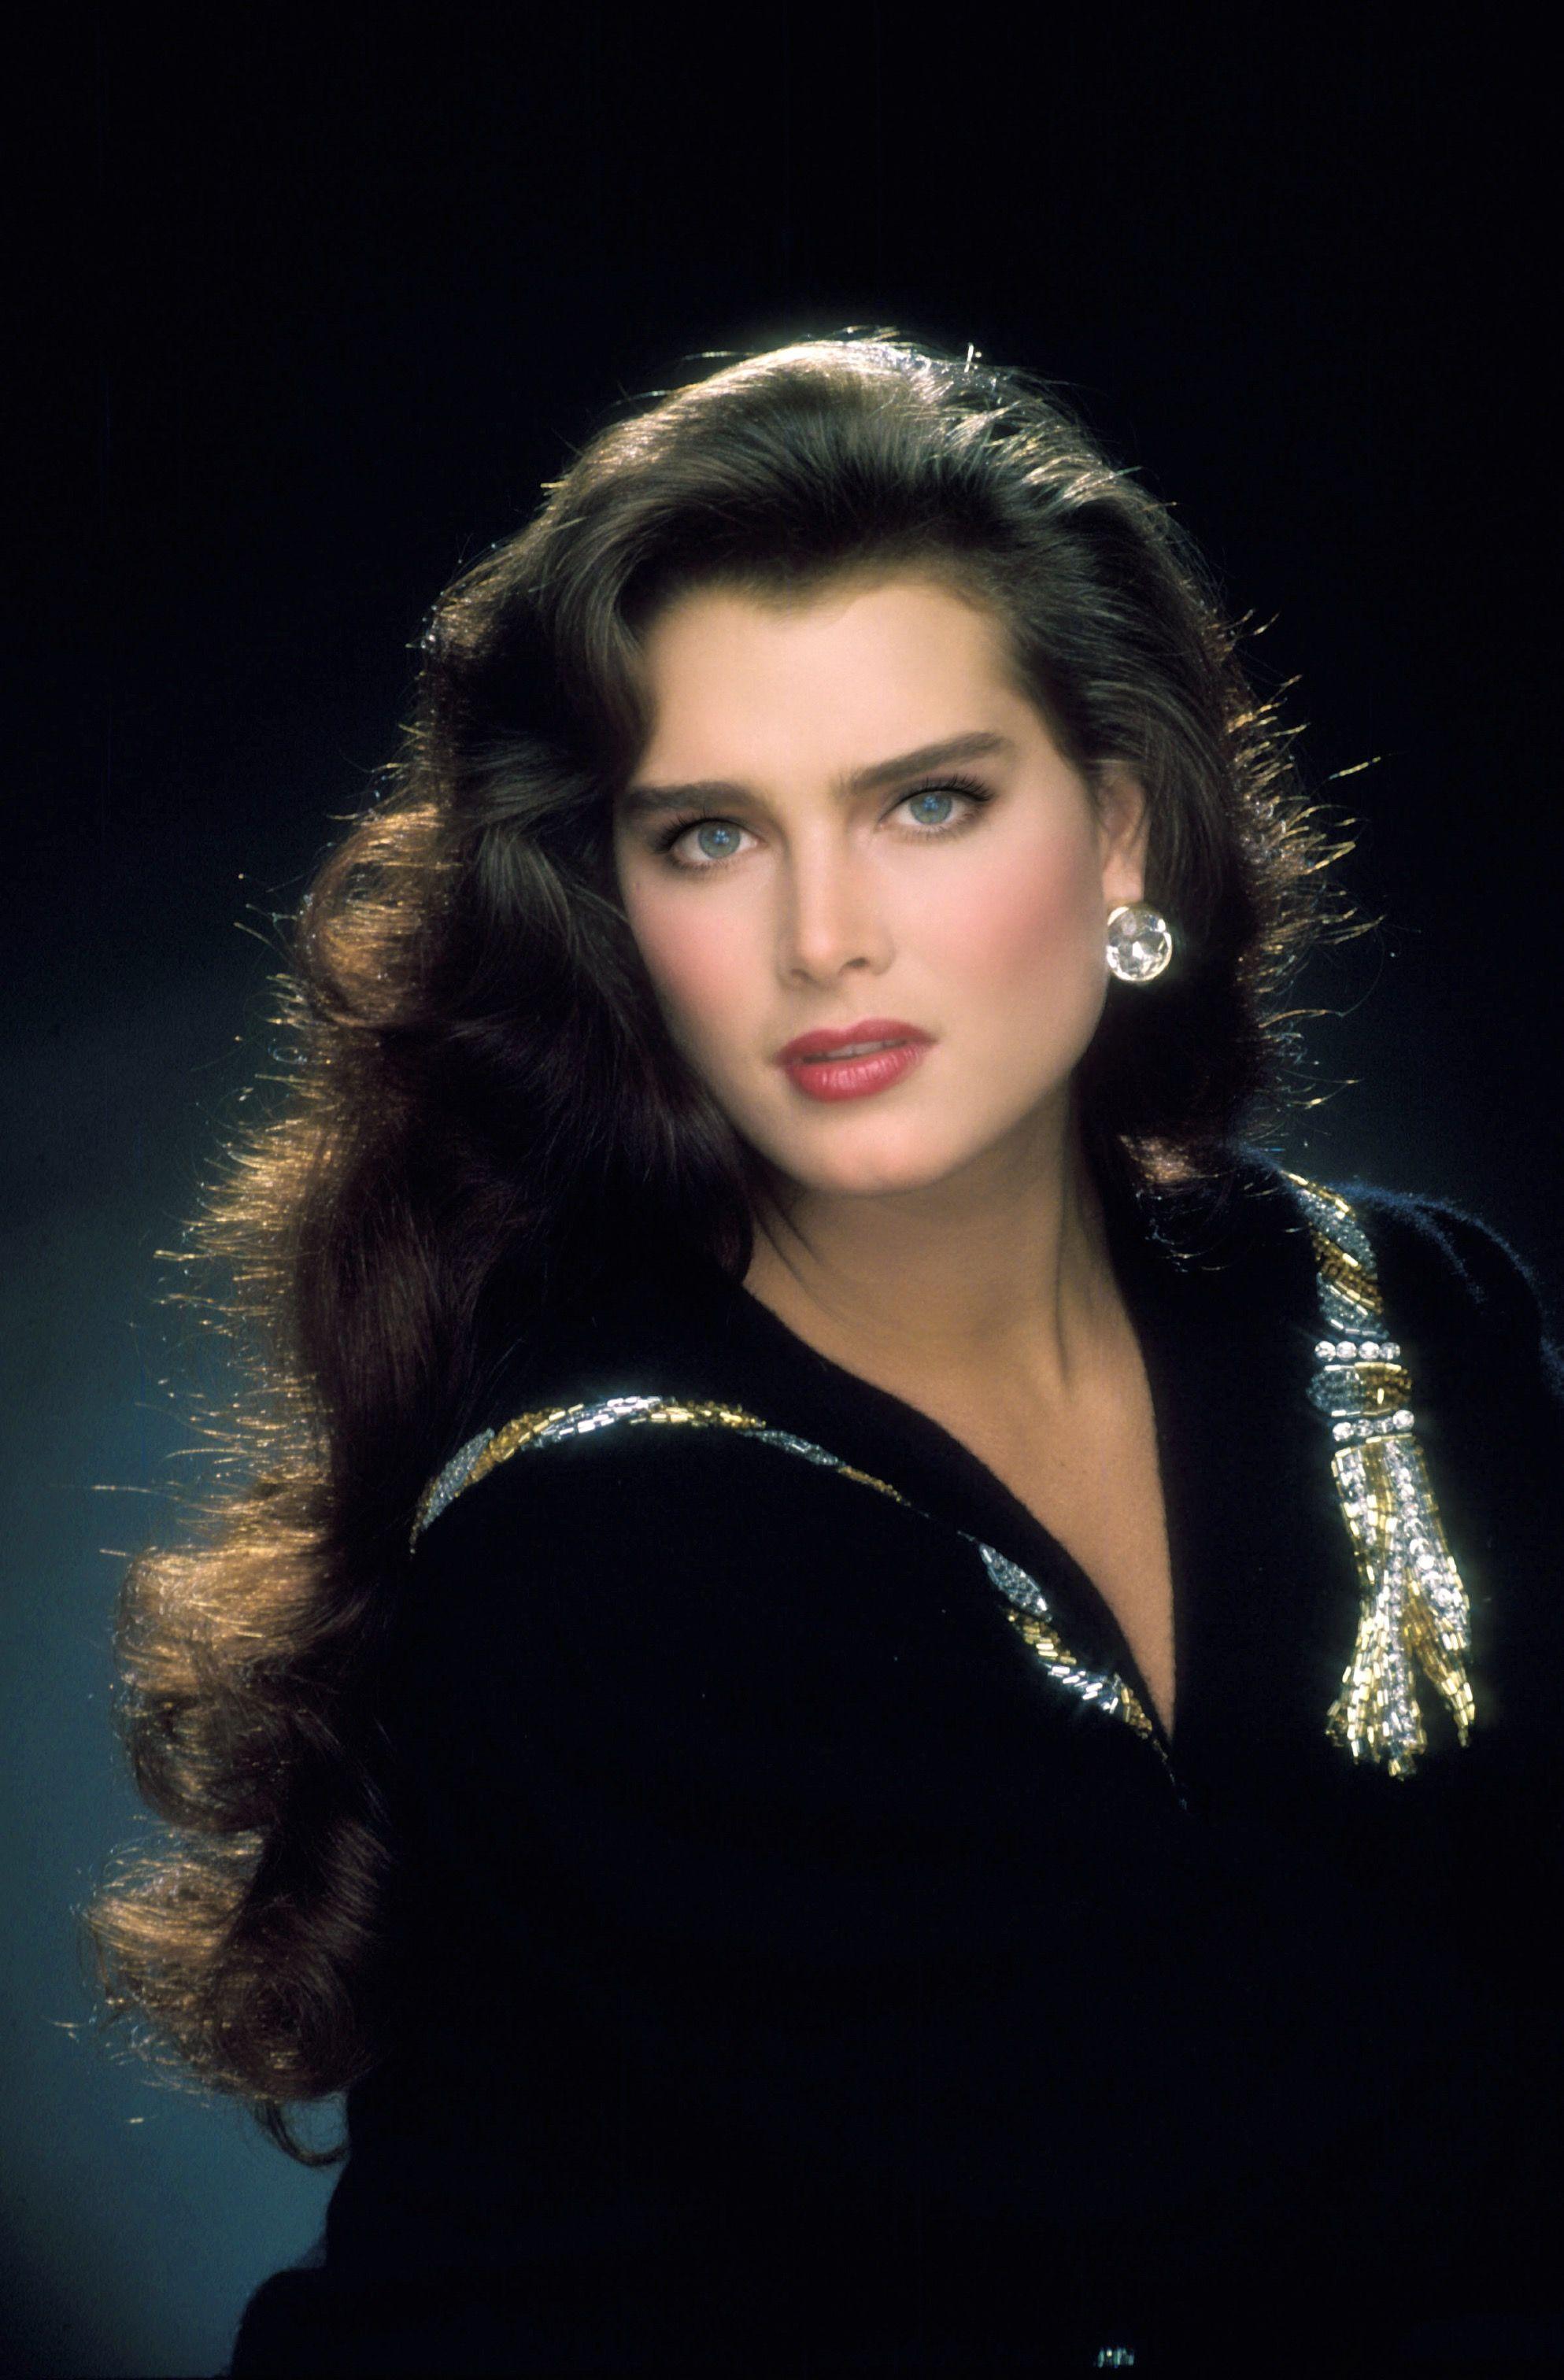 Brooke Shields Legend Decades In 1980 49